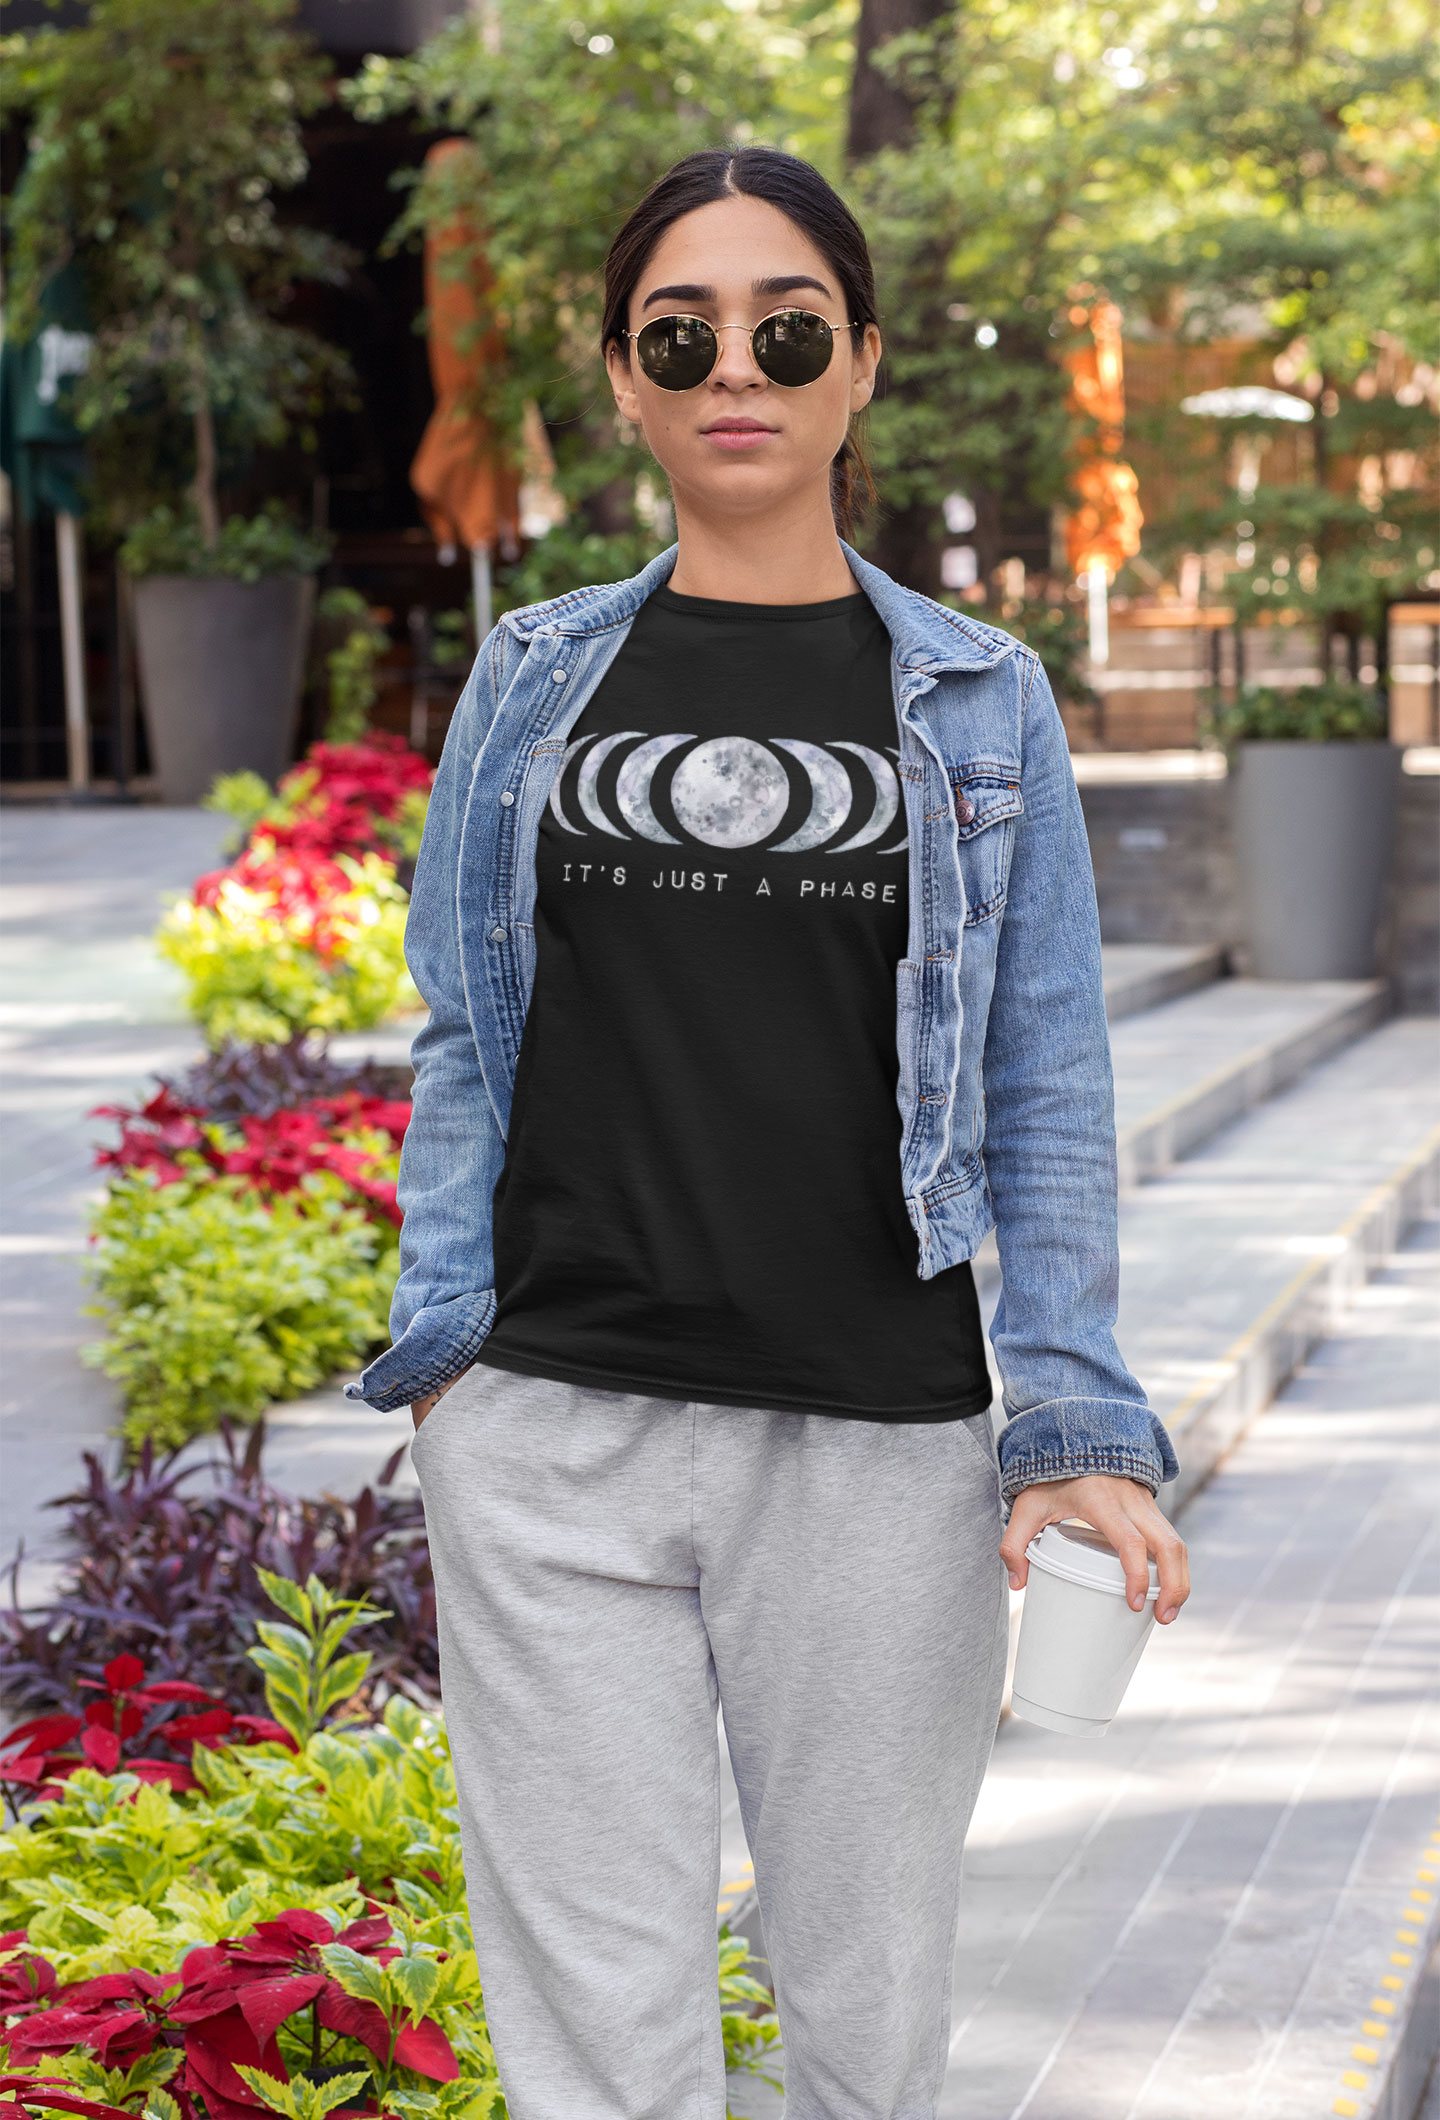 Awake-&-Aware-awakenaware.com-@awakenawareinc-Women-Wearing---Its-Just-a-Phase-Moon-Tee